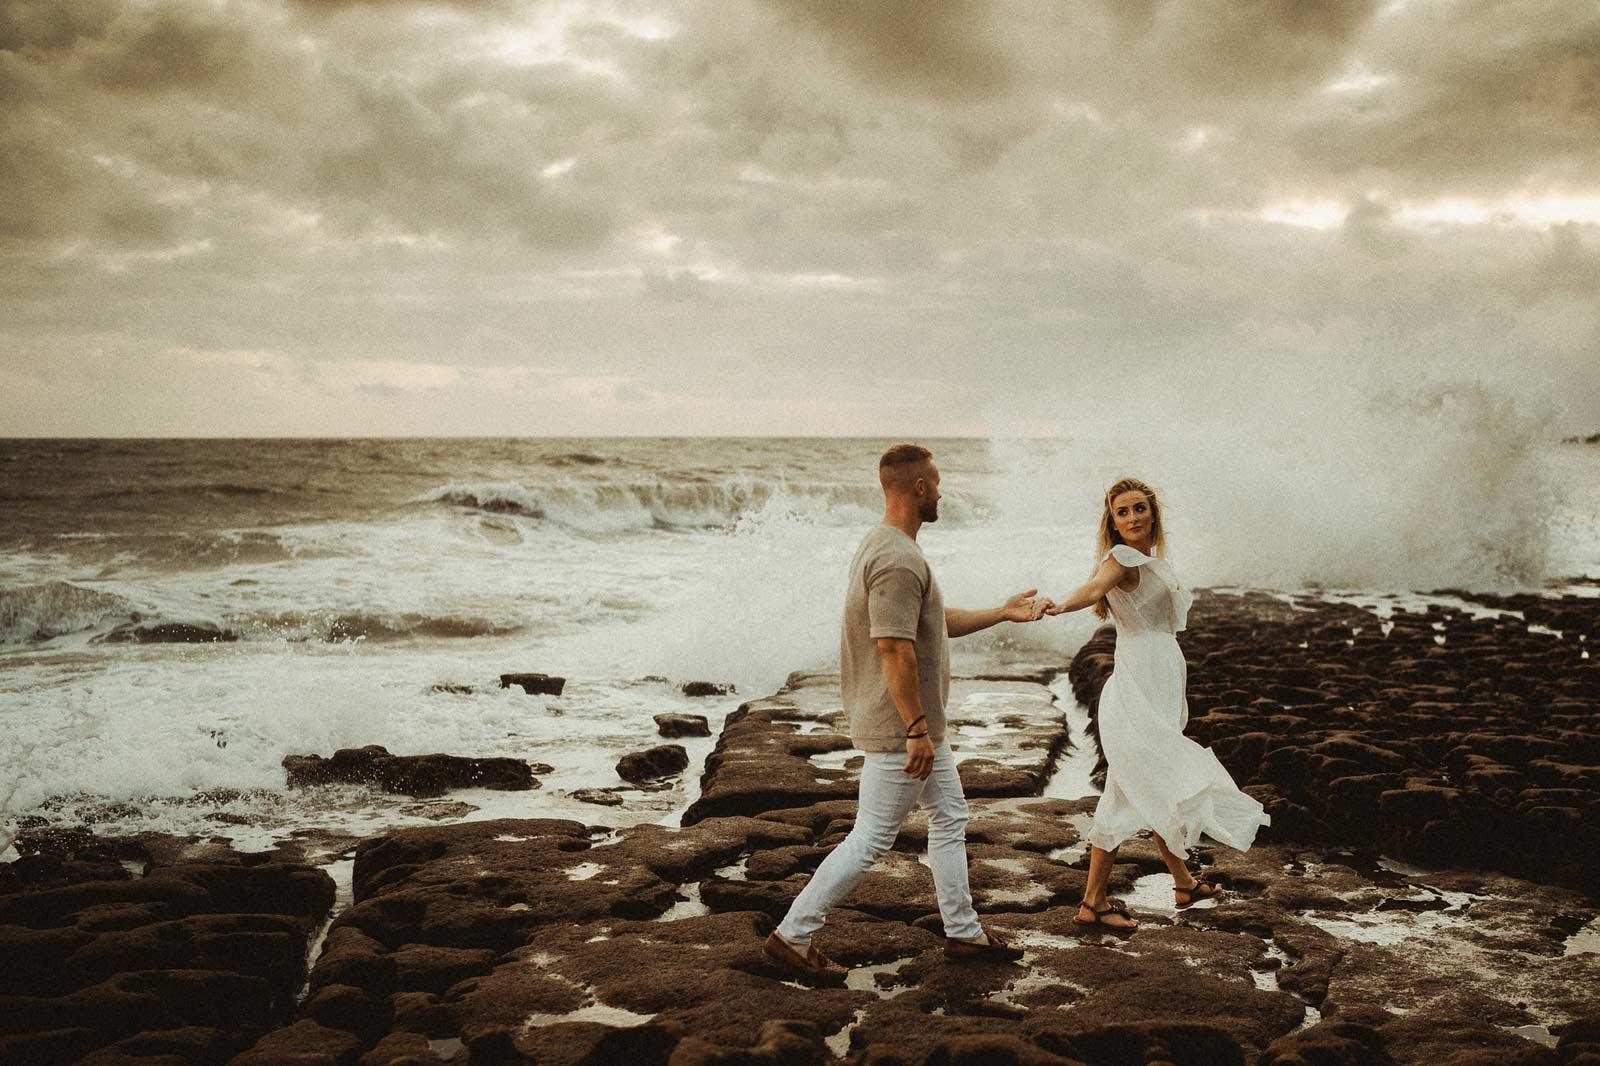 Couple walk across the beach holding hands